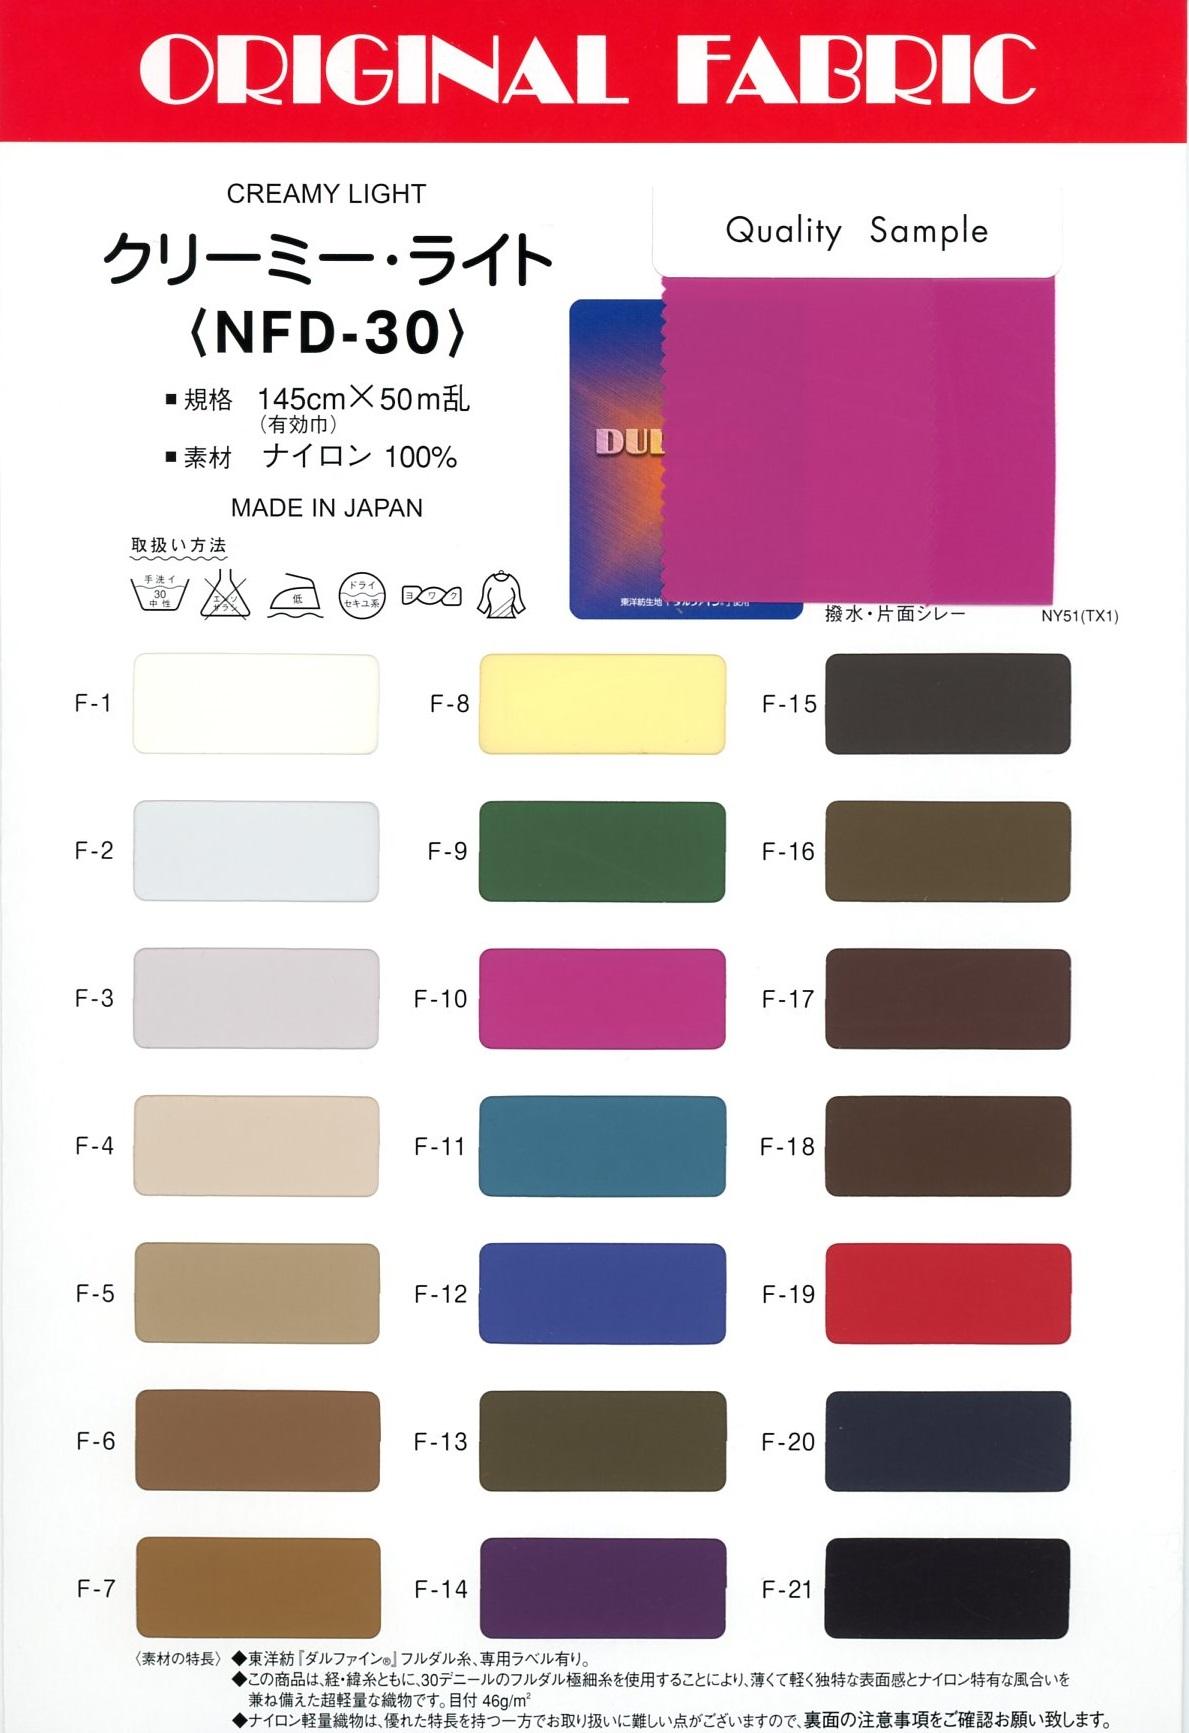 NFD-30 クリーミー・ライト[生地] Masuda(マスダ)/オークラ商事 - ApparelX アパレル資材卸通販